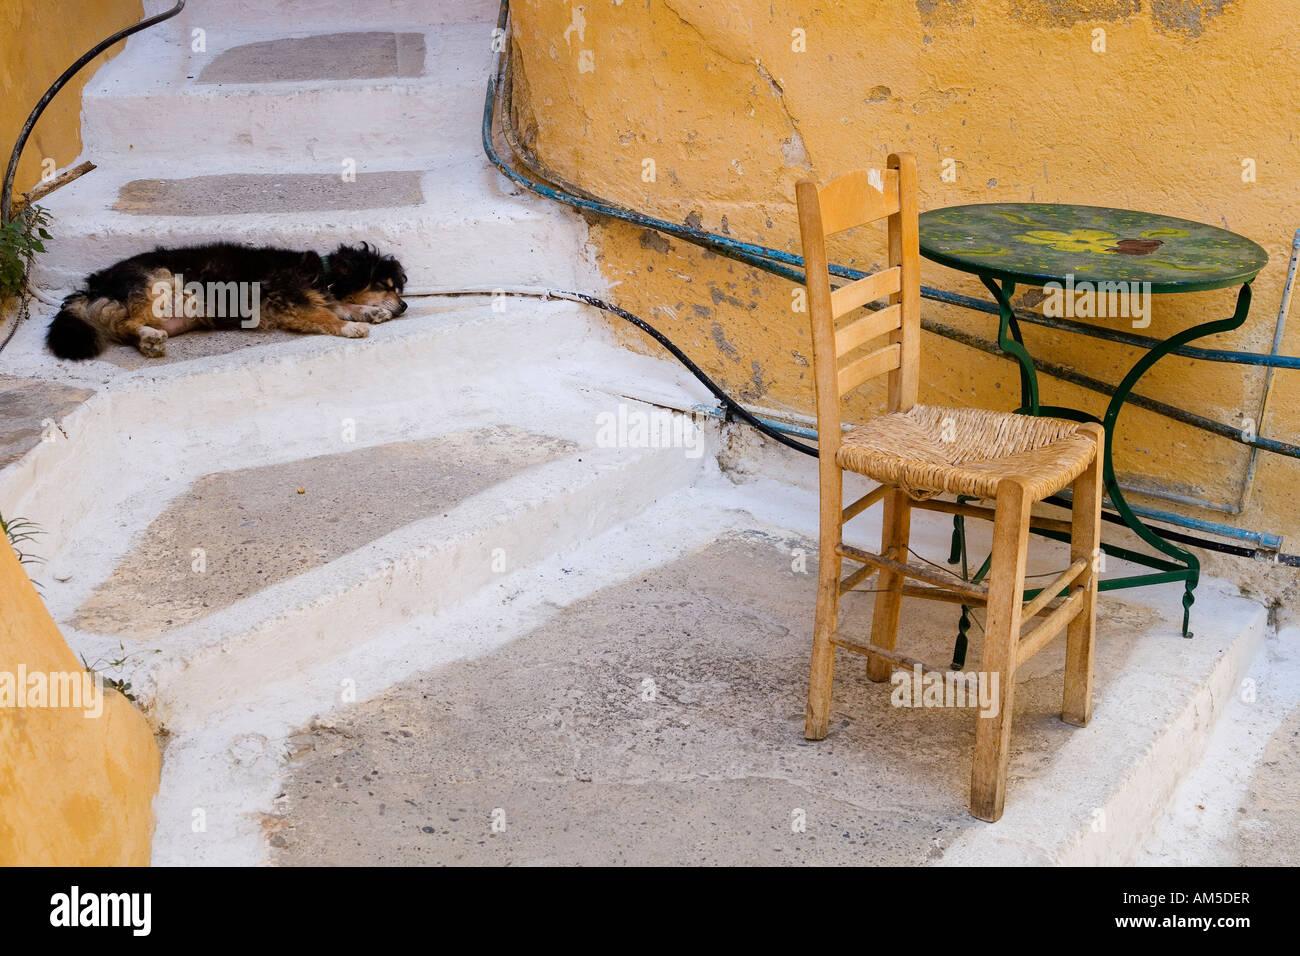 Dog asleep on a stairway, Greece, Europe - Stock Image